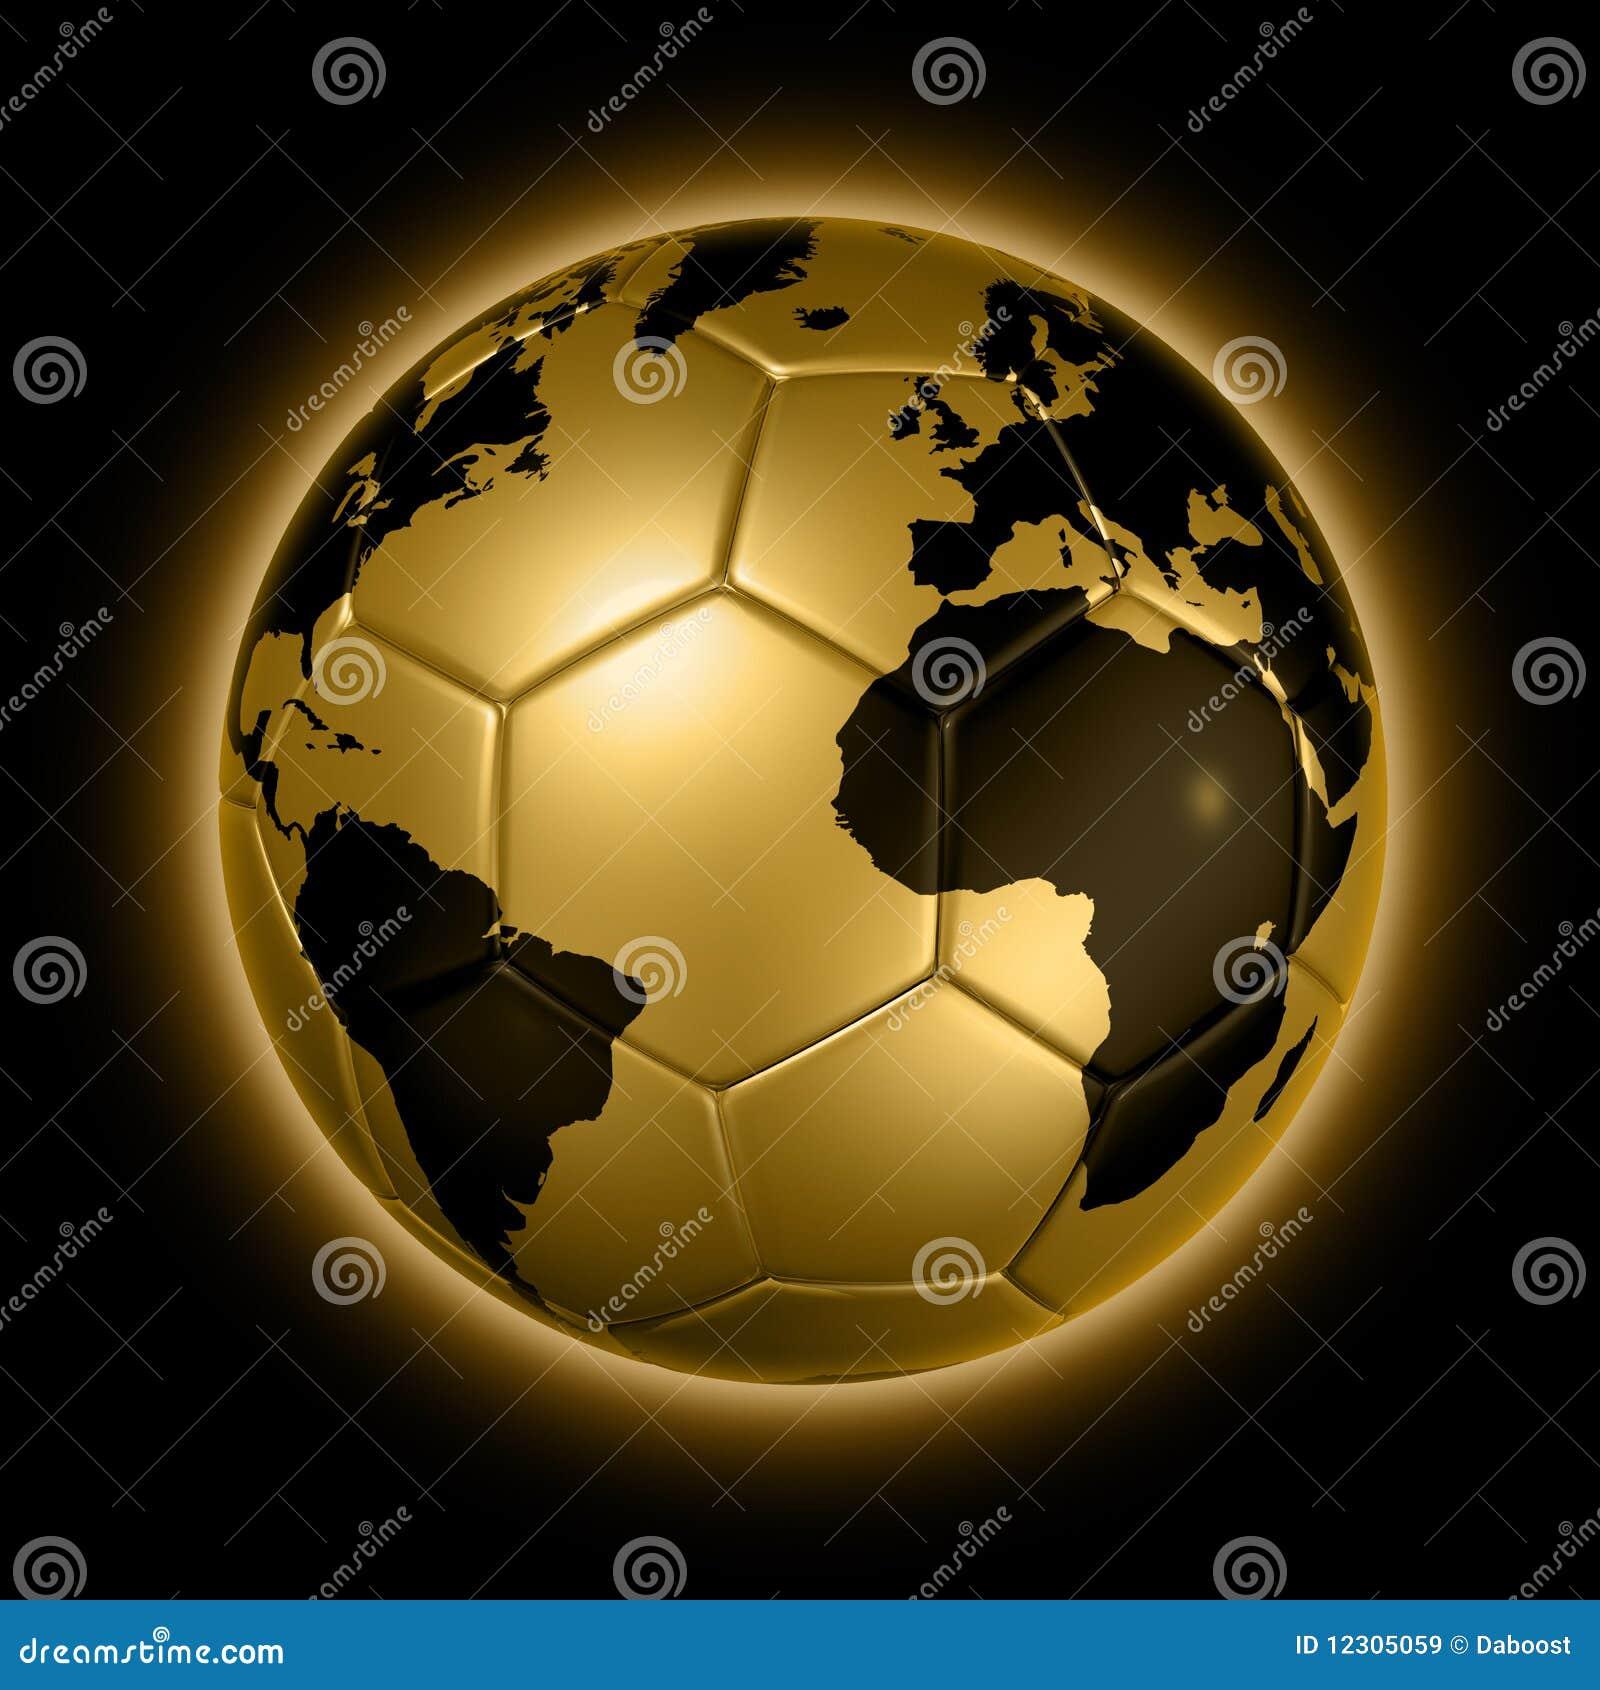 Gold soccer football ball world globe stock illustration gold soccer football ball world globe gumiabroncs Choice Image